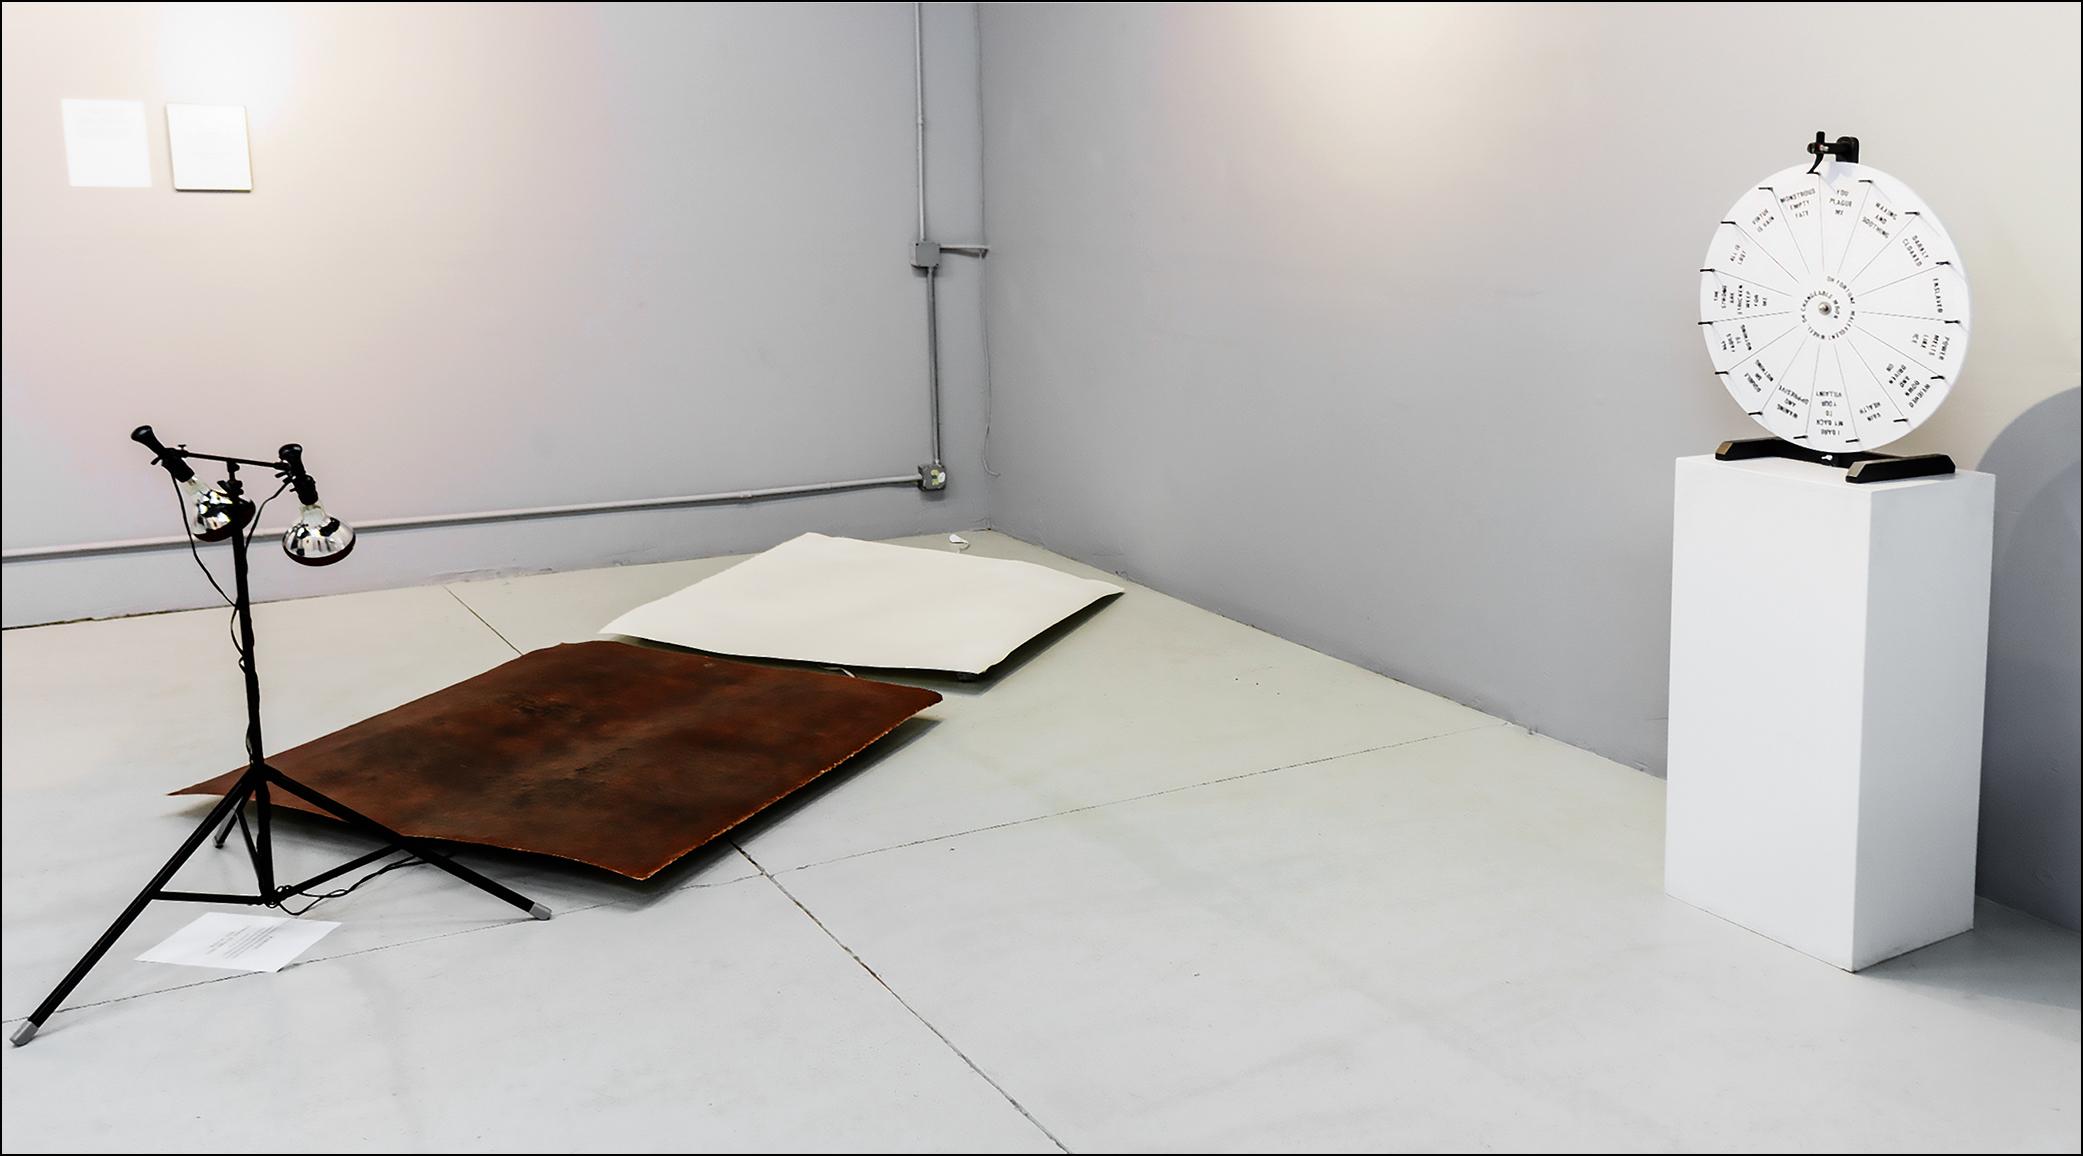 Ryan James Gallery (view 2)